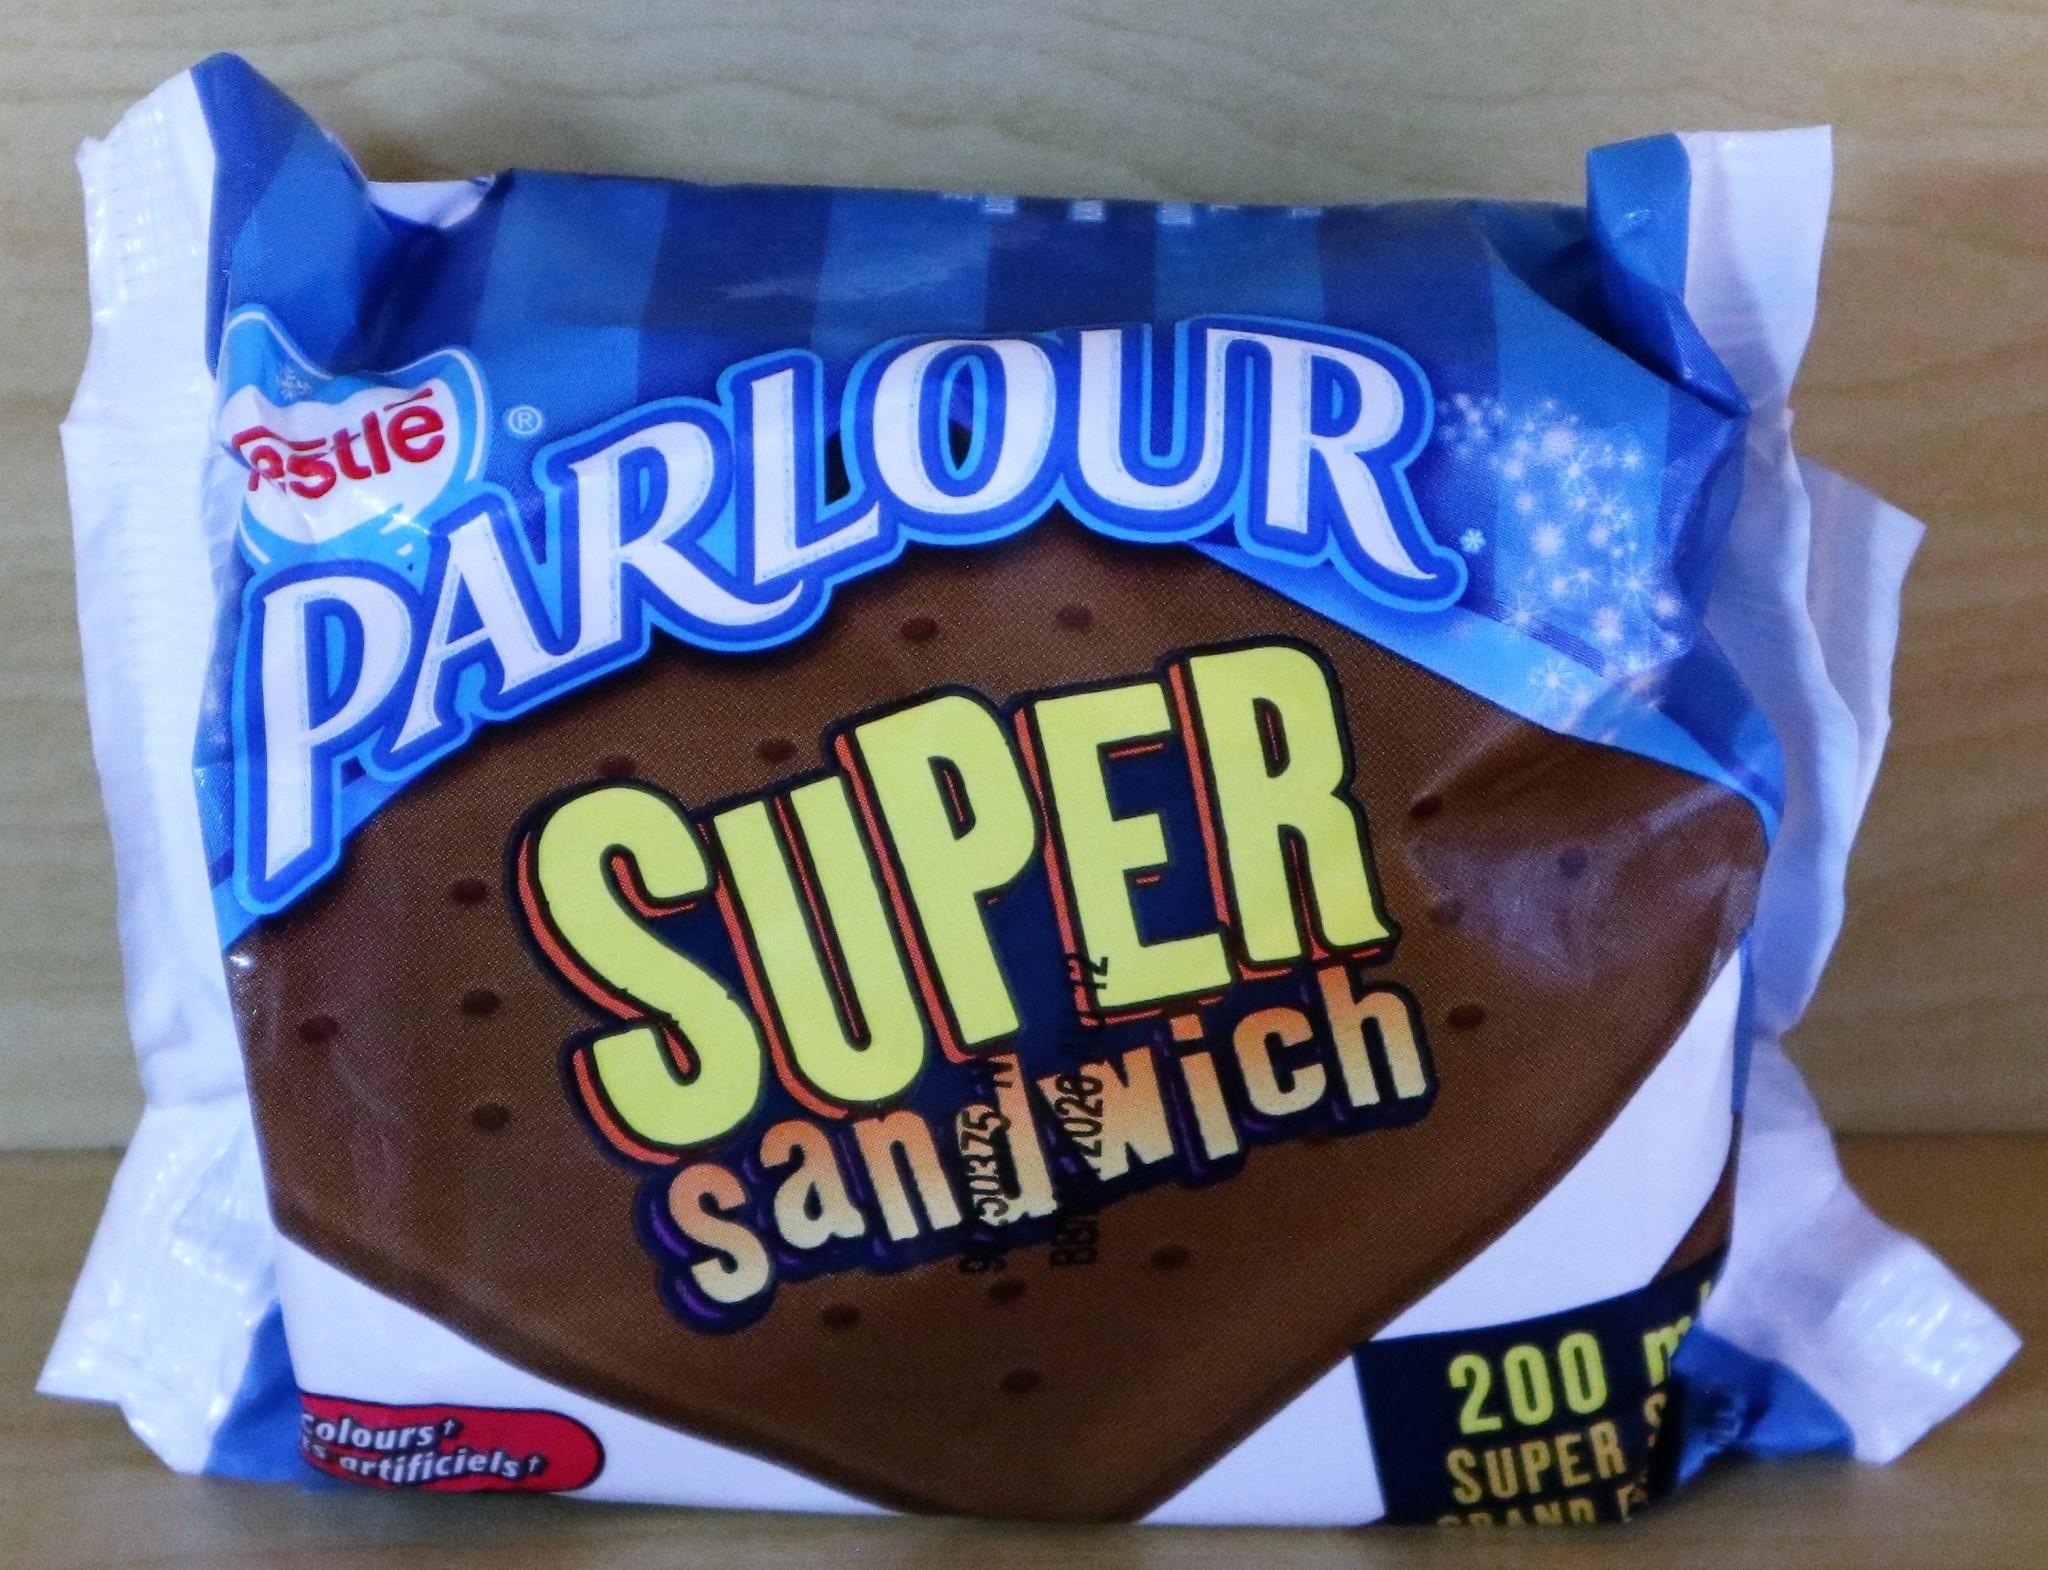 Parlour - Super Sandwich - 200mL